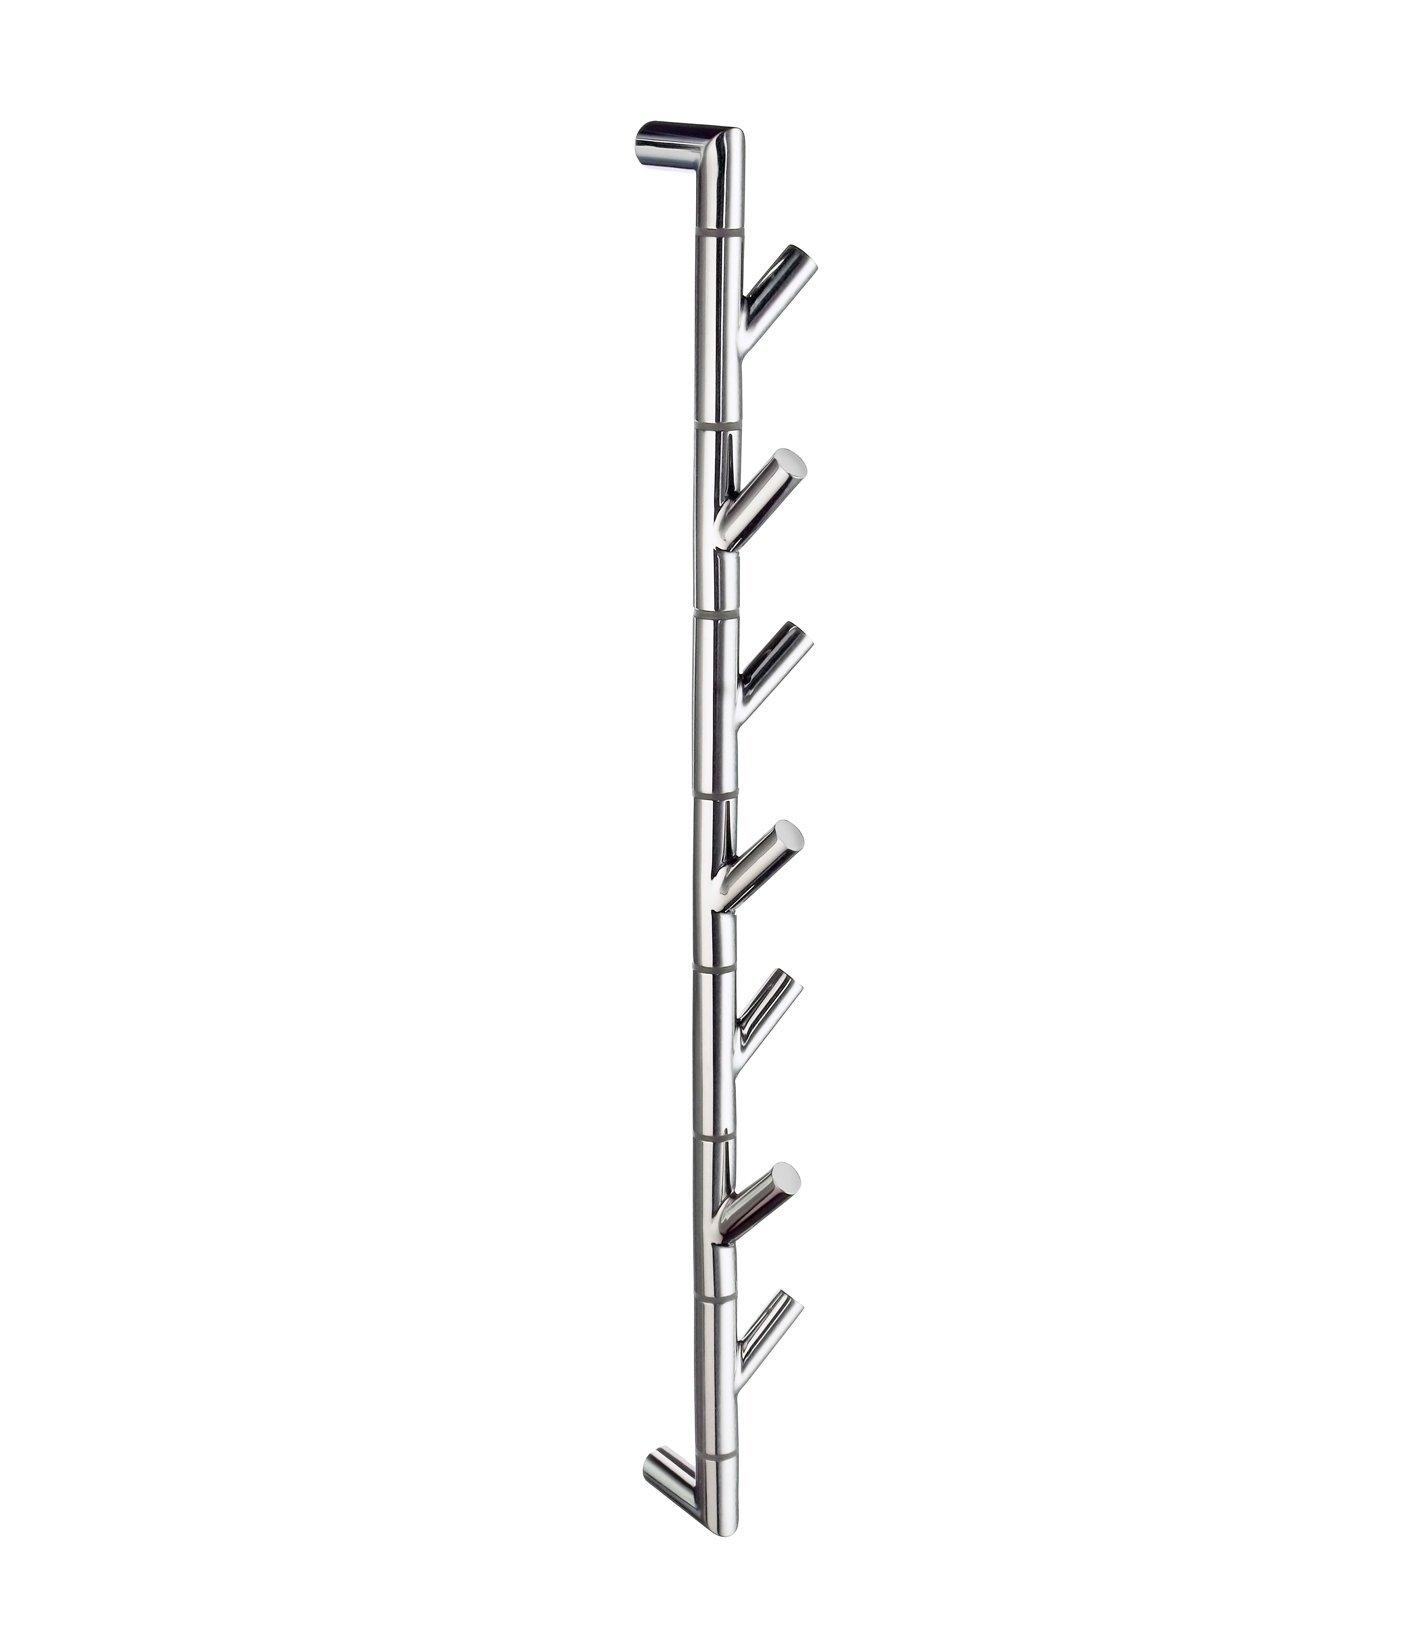 Smedbo SME_FK630 Hook Swing, Stainless Steel Polished